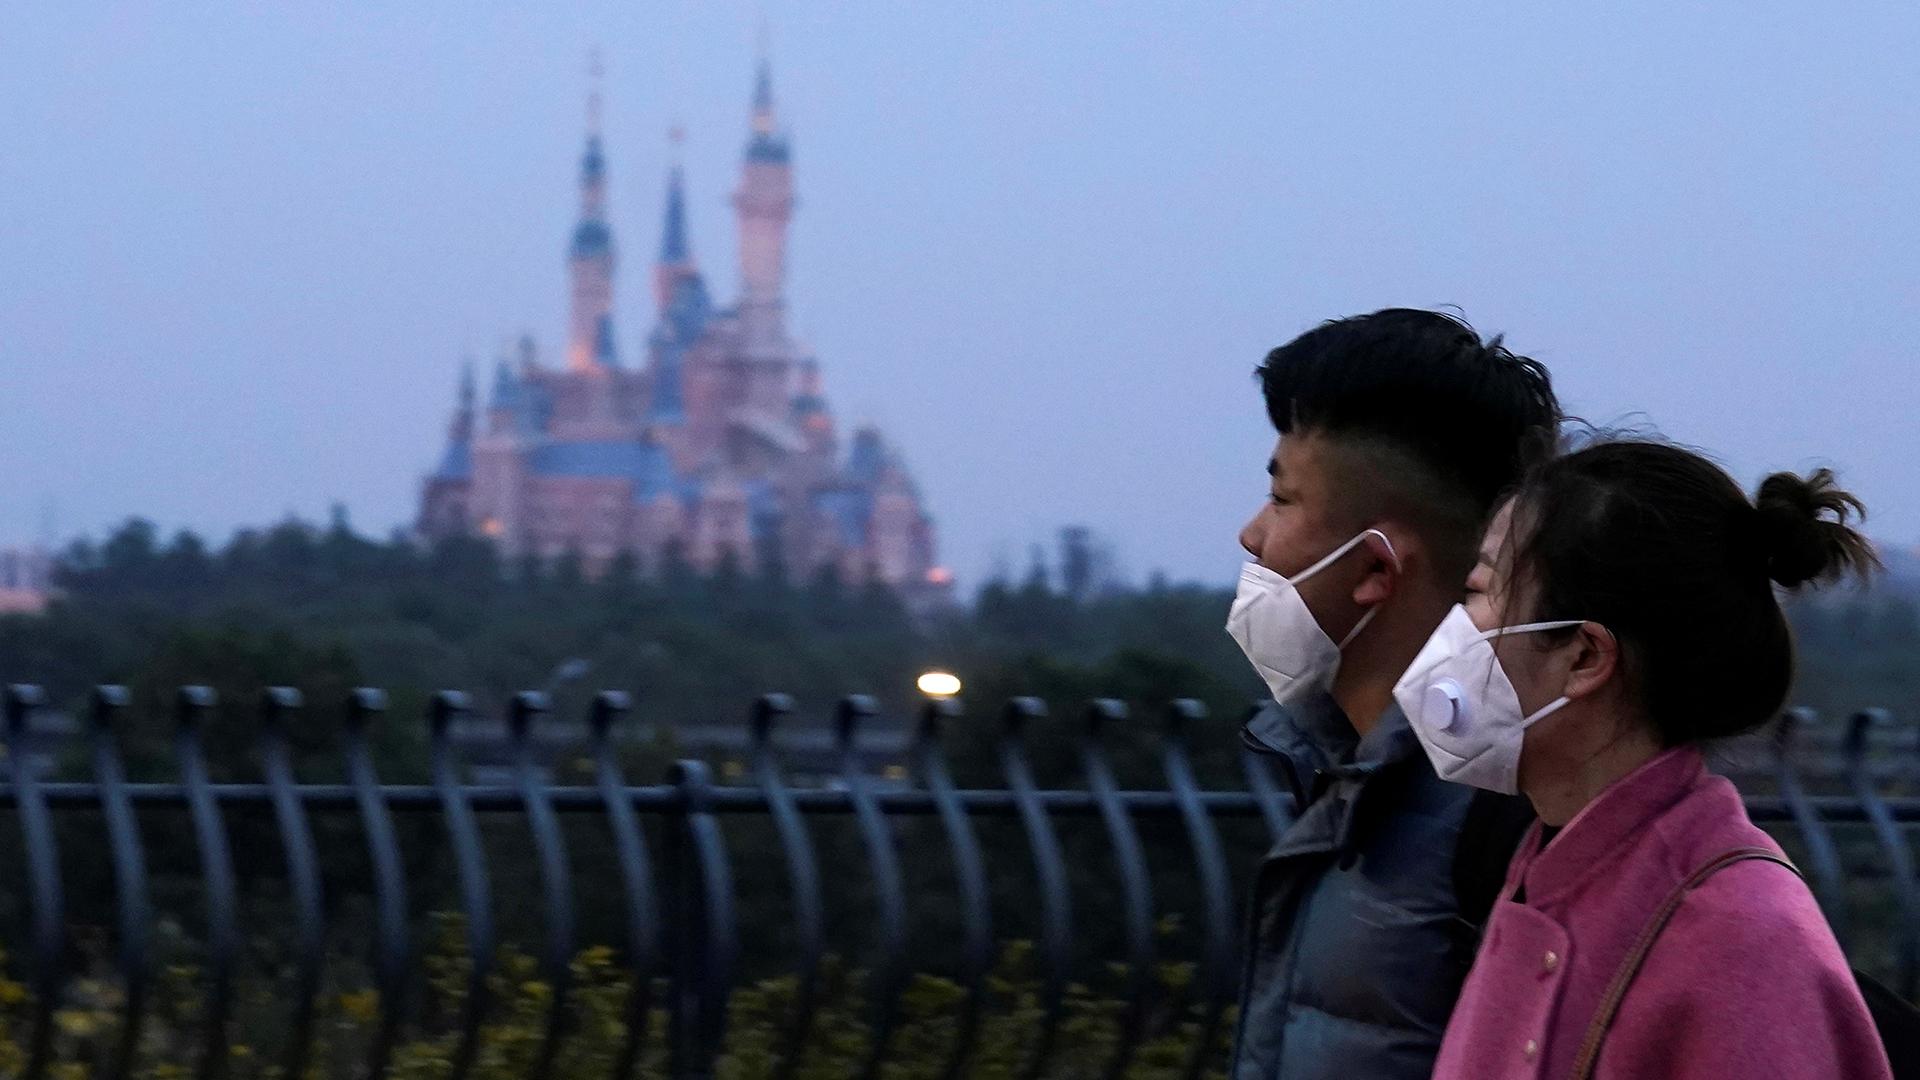 Coronavirus outbreak: global businesses shut down operations in China